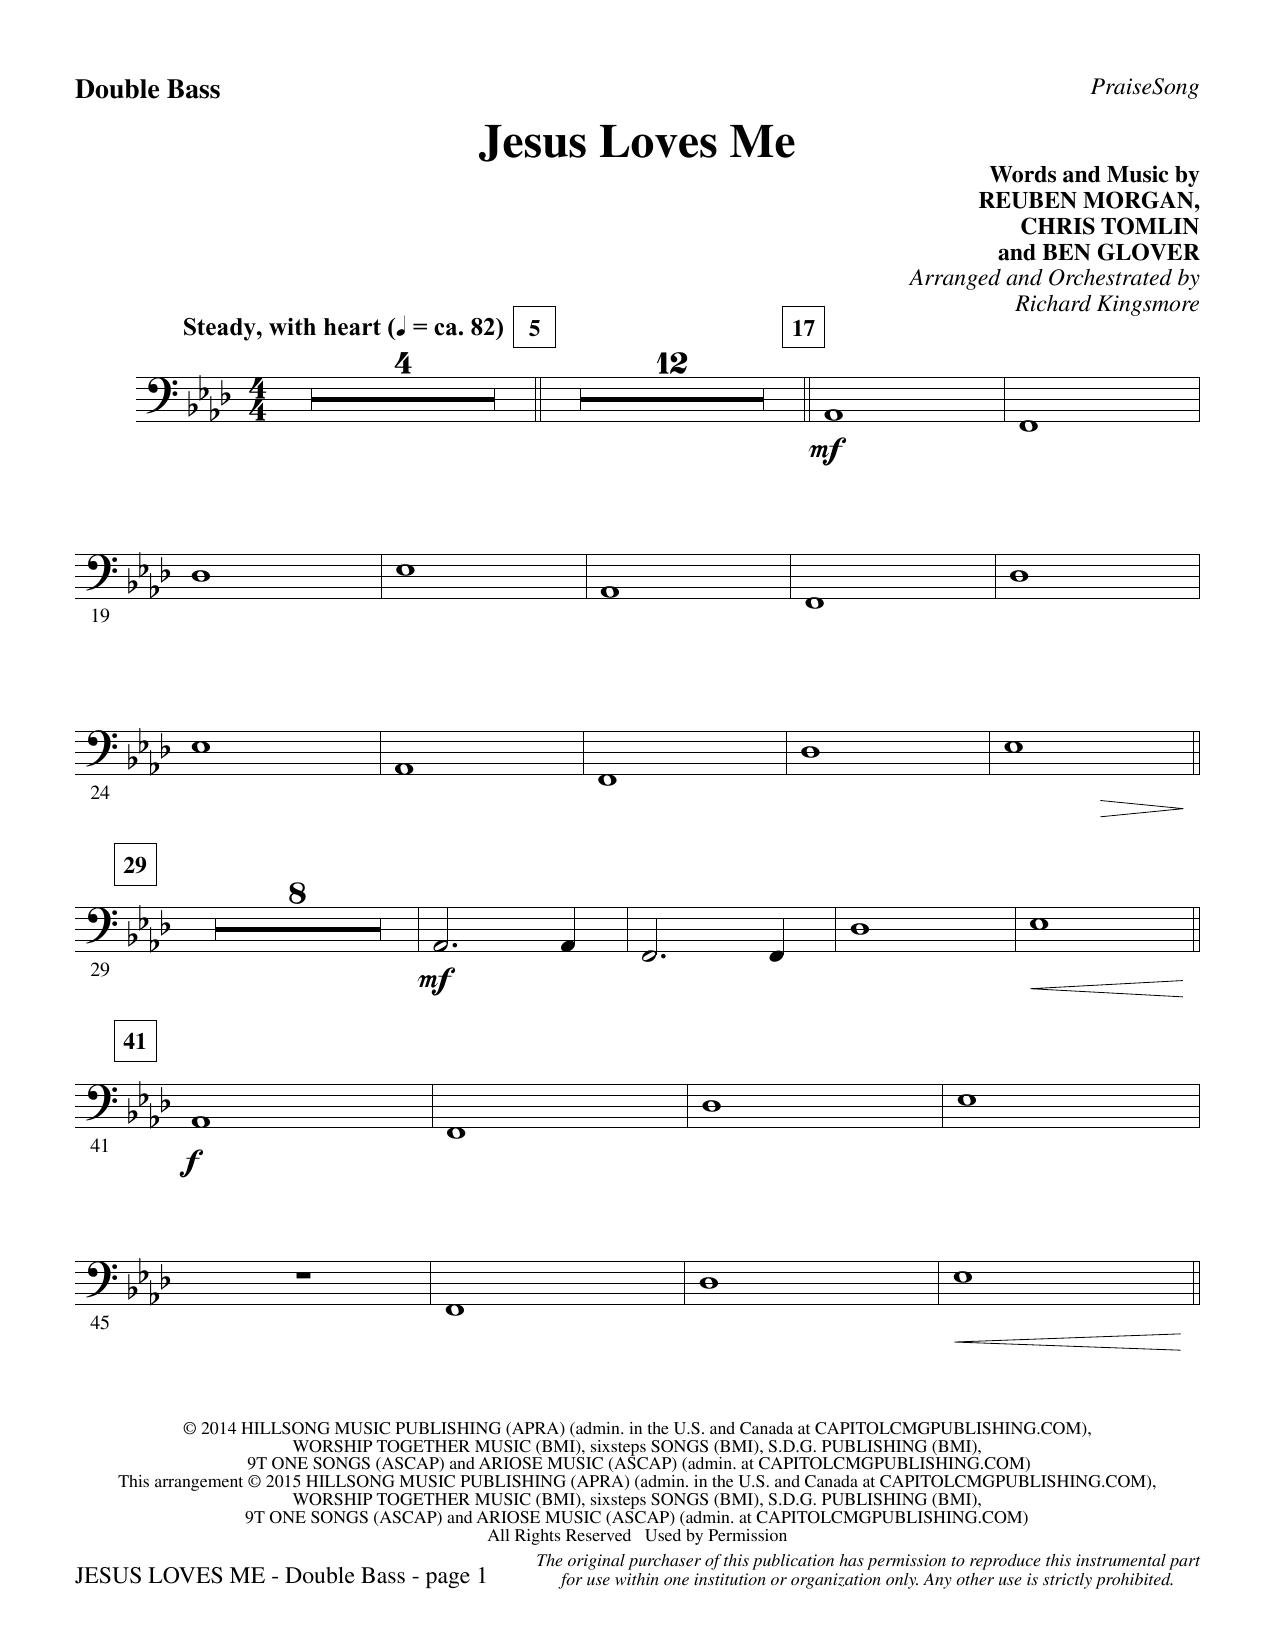 Jesus Loves Me - Double Bass sheet music